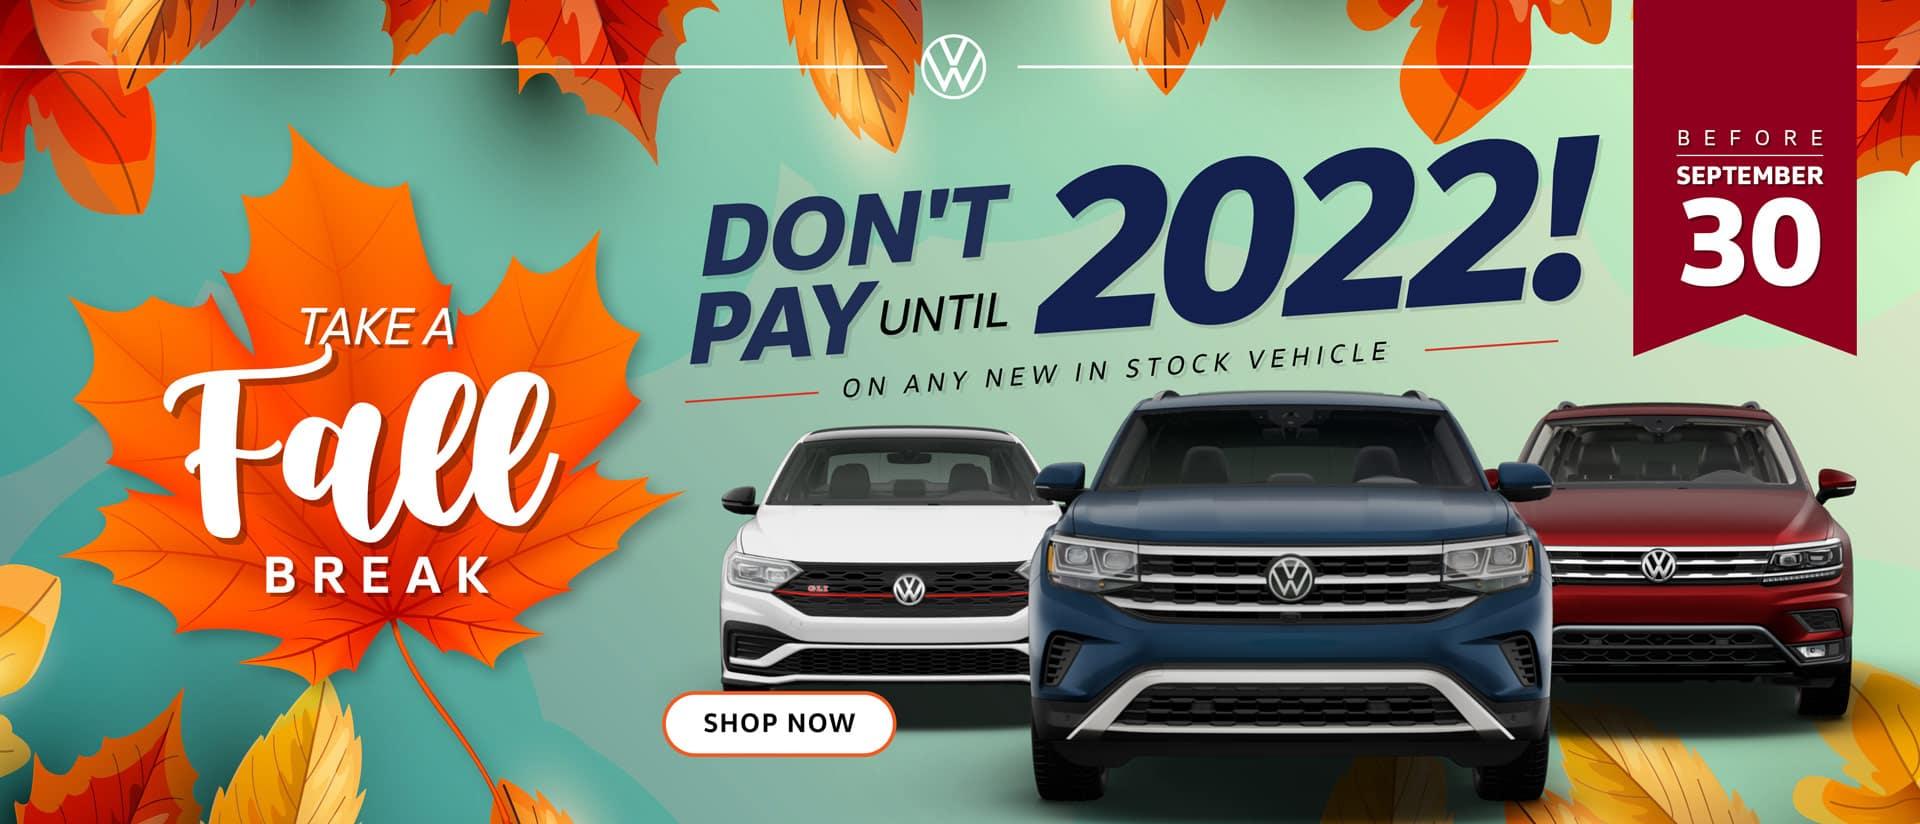 1760632_VW_DontPay2022_WB